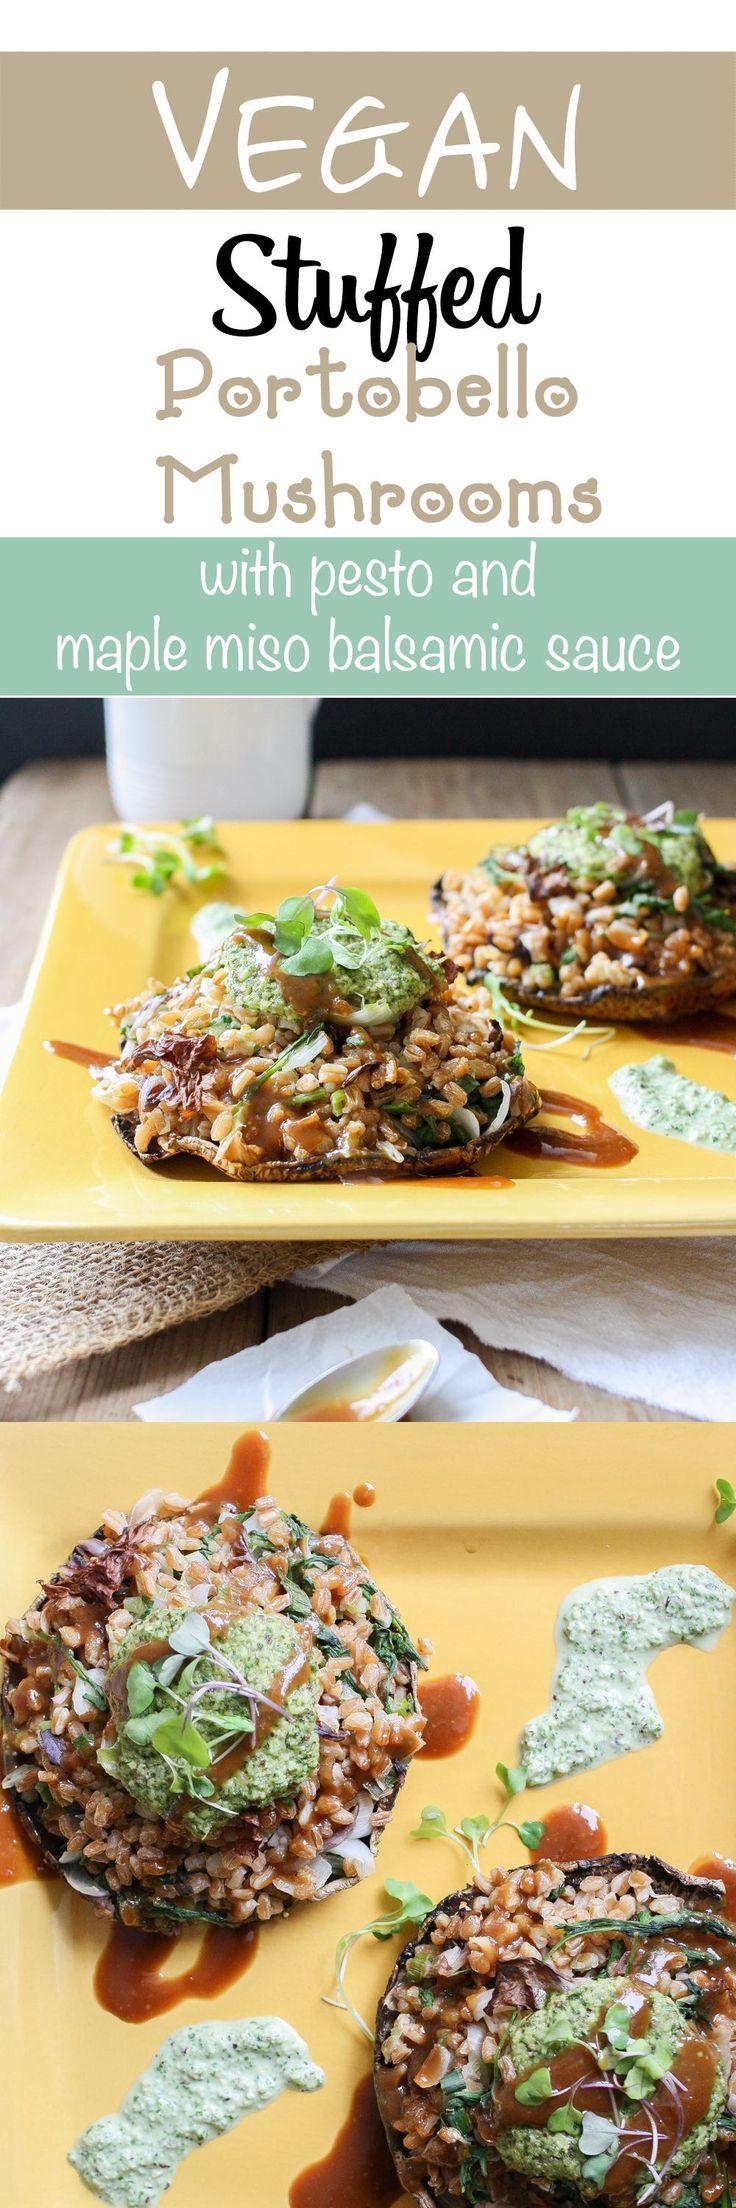 Italian Farro Stuffed Portobellos   www.veggiesdontbite.com   #vegan #plantbased #greens #italian #OrganicBound #Ad